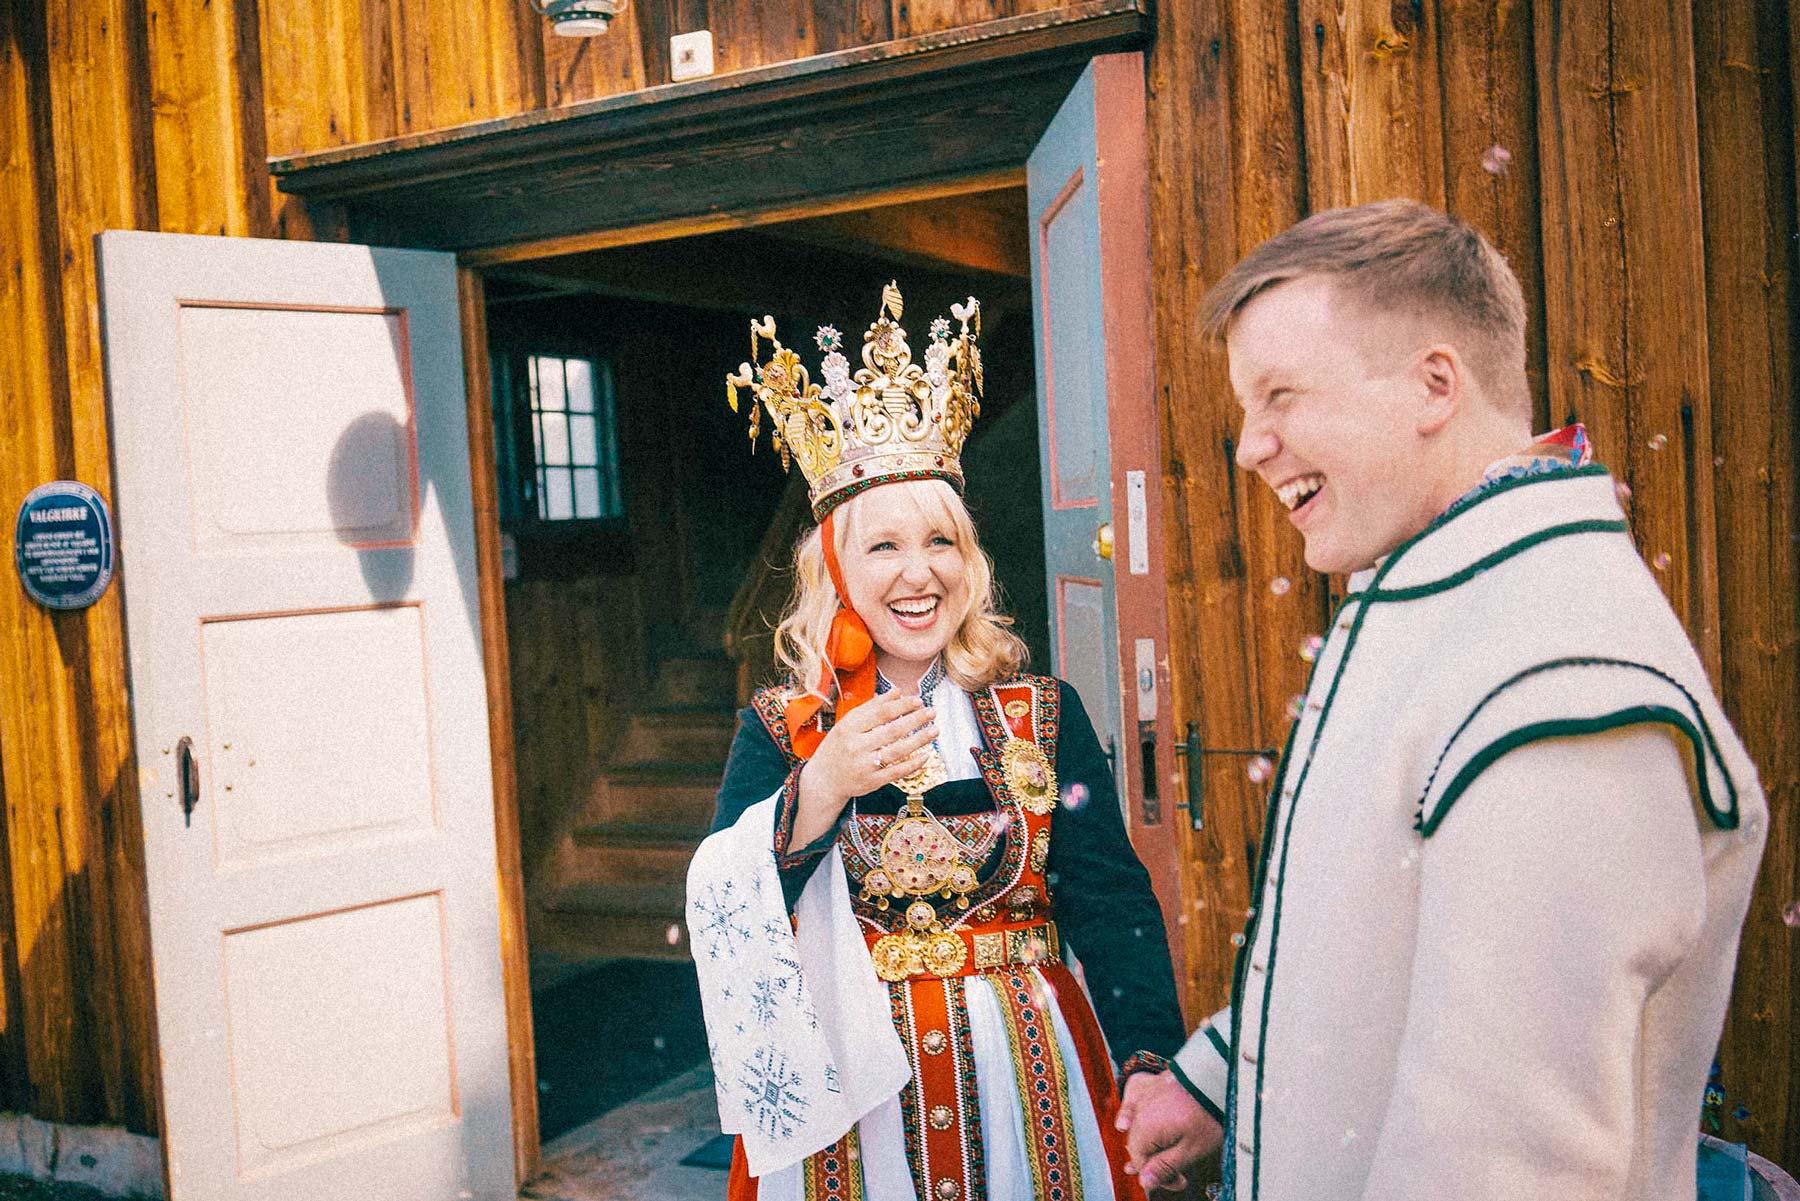 bunad bryllup, lek med såpebobler utenfor kirke